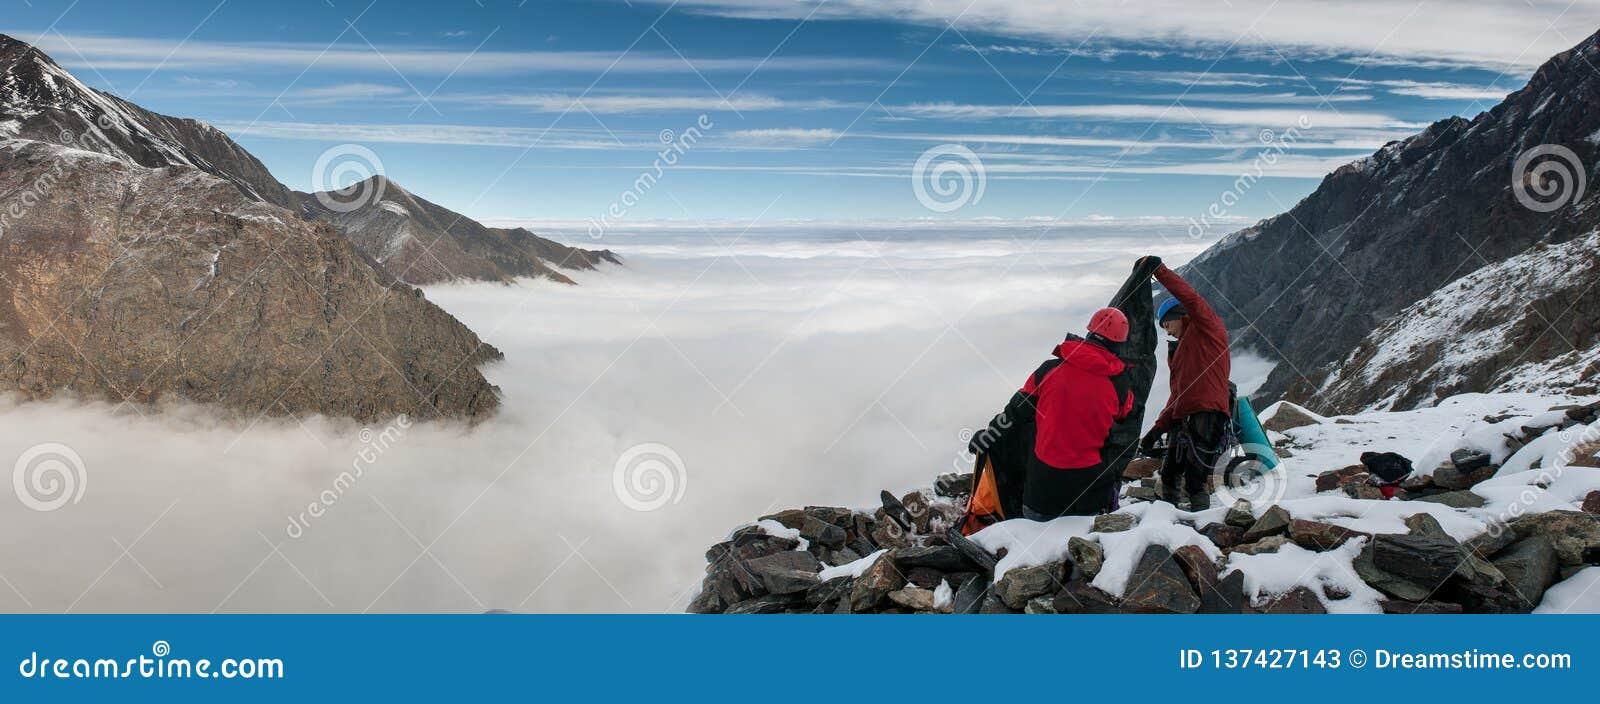 Bergen, reis, aard, sneeuw, wolken